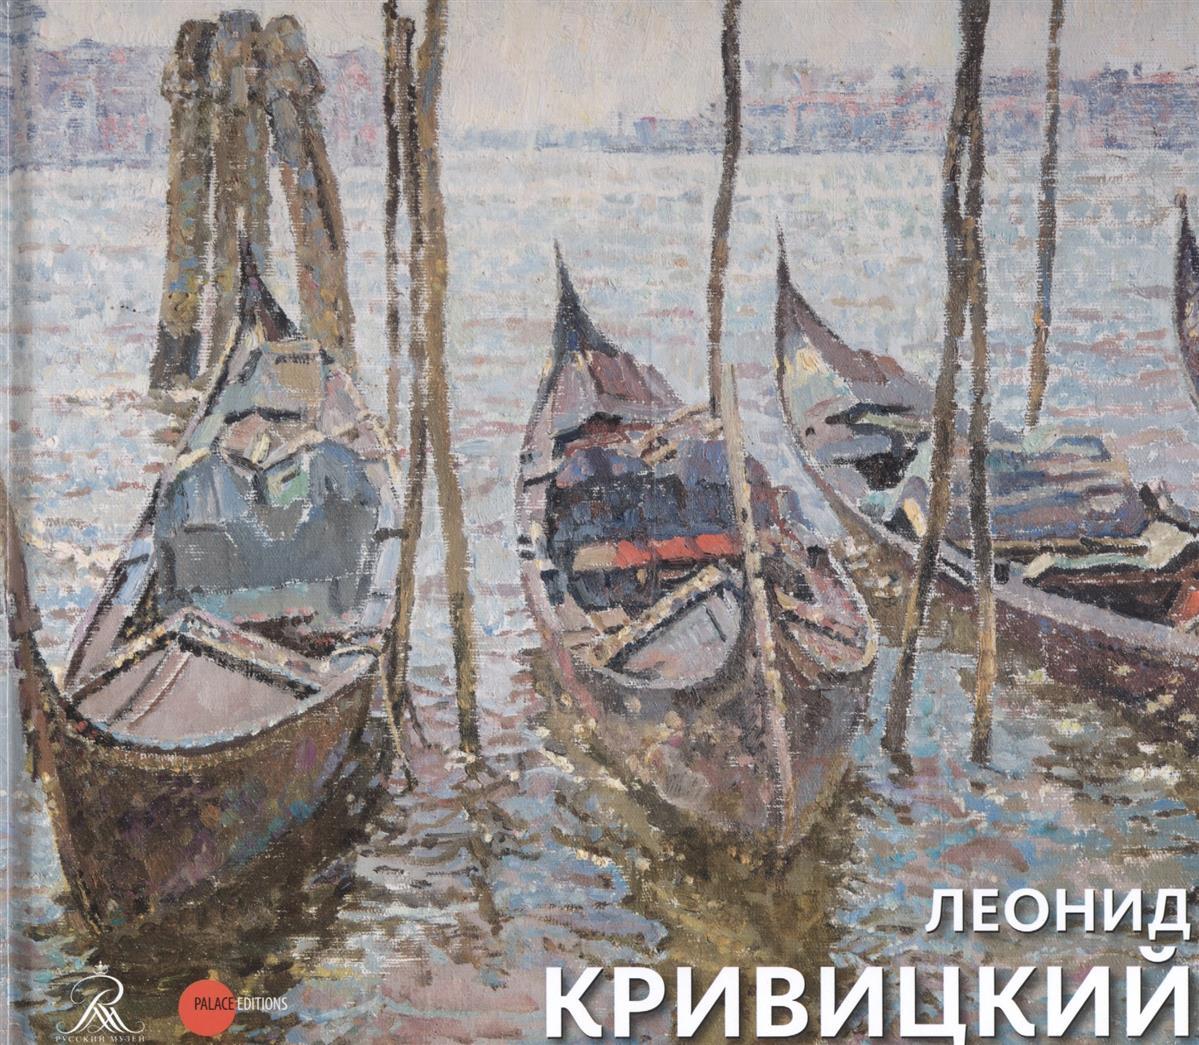 Леонид Кривицкий